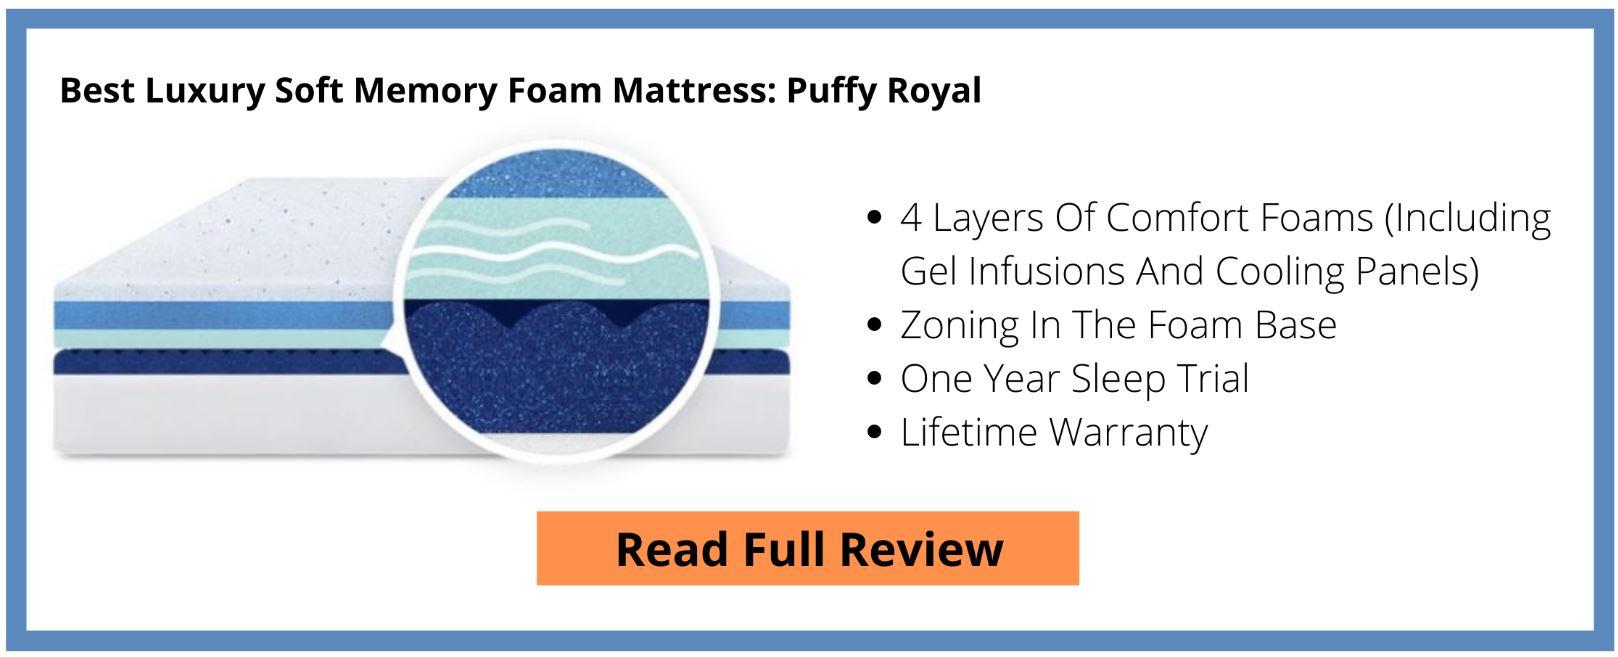 Puffy Royal Mattress Review Button